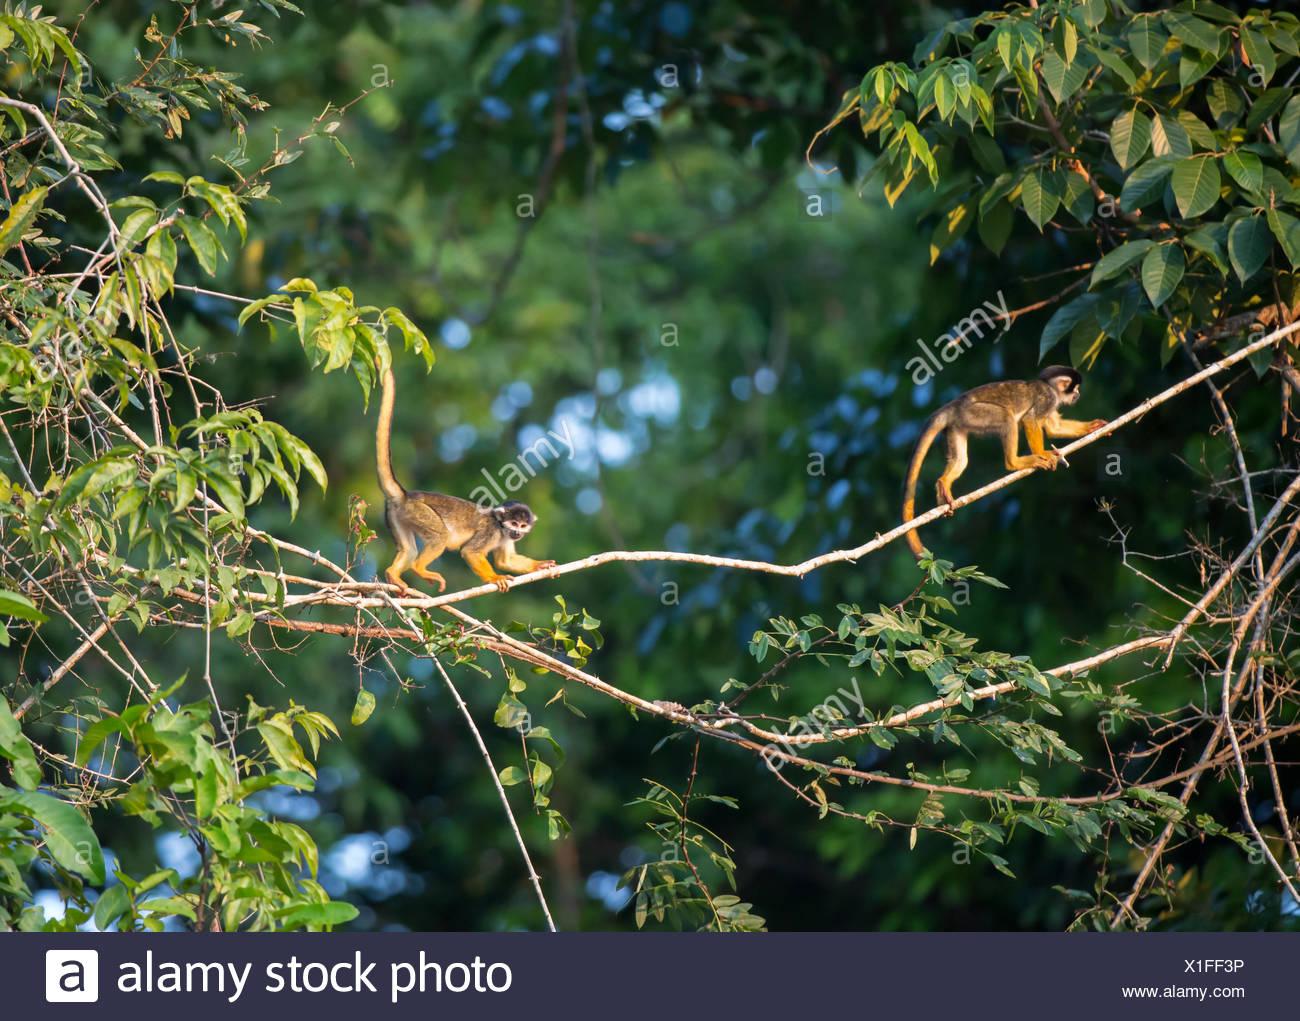 Squirrel monkeys in trees - photo#32